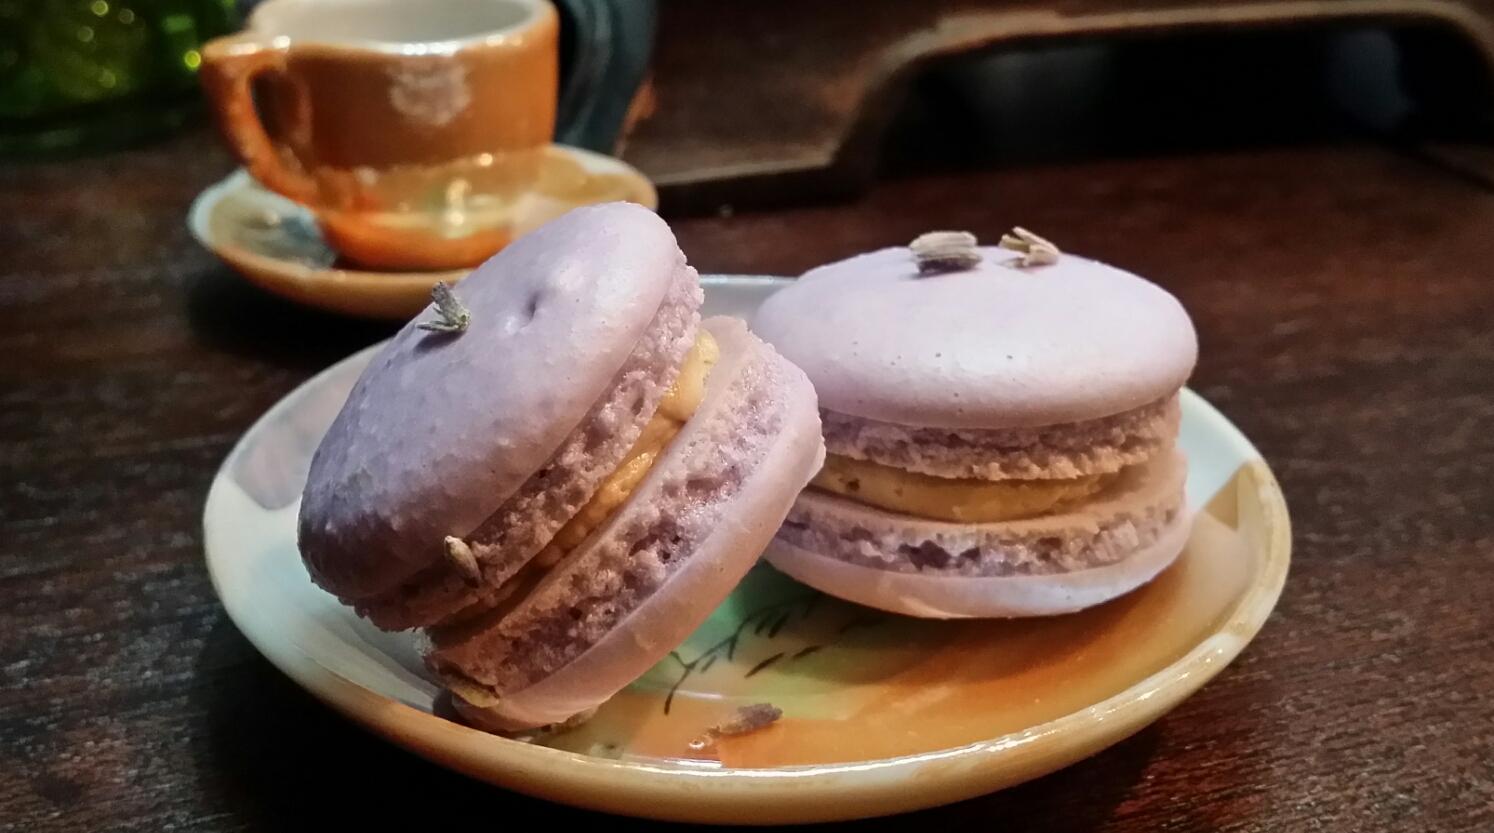 Charlette's Macarons